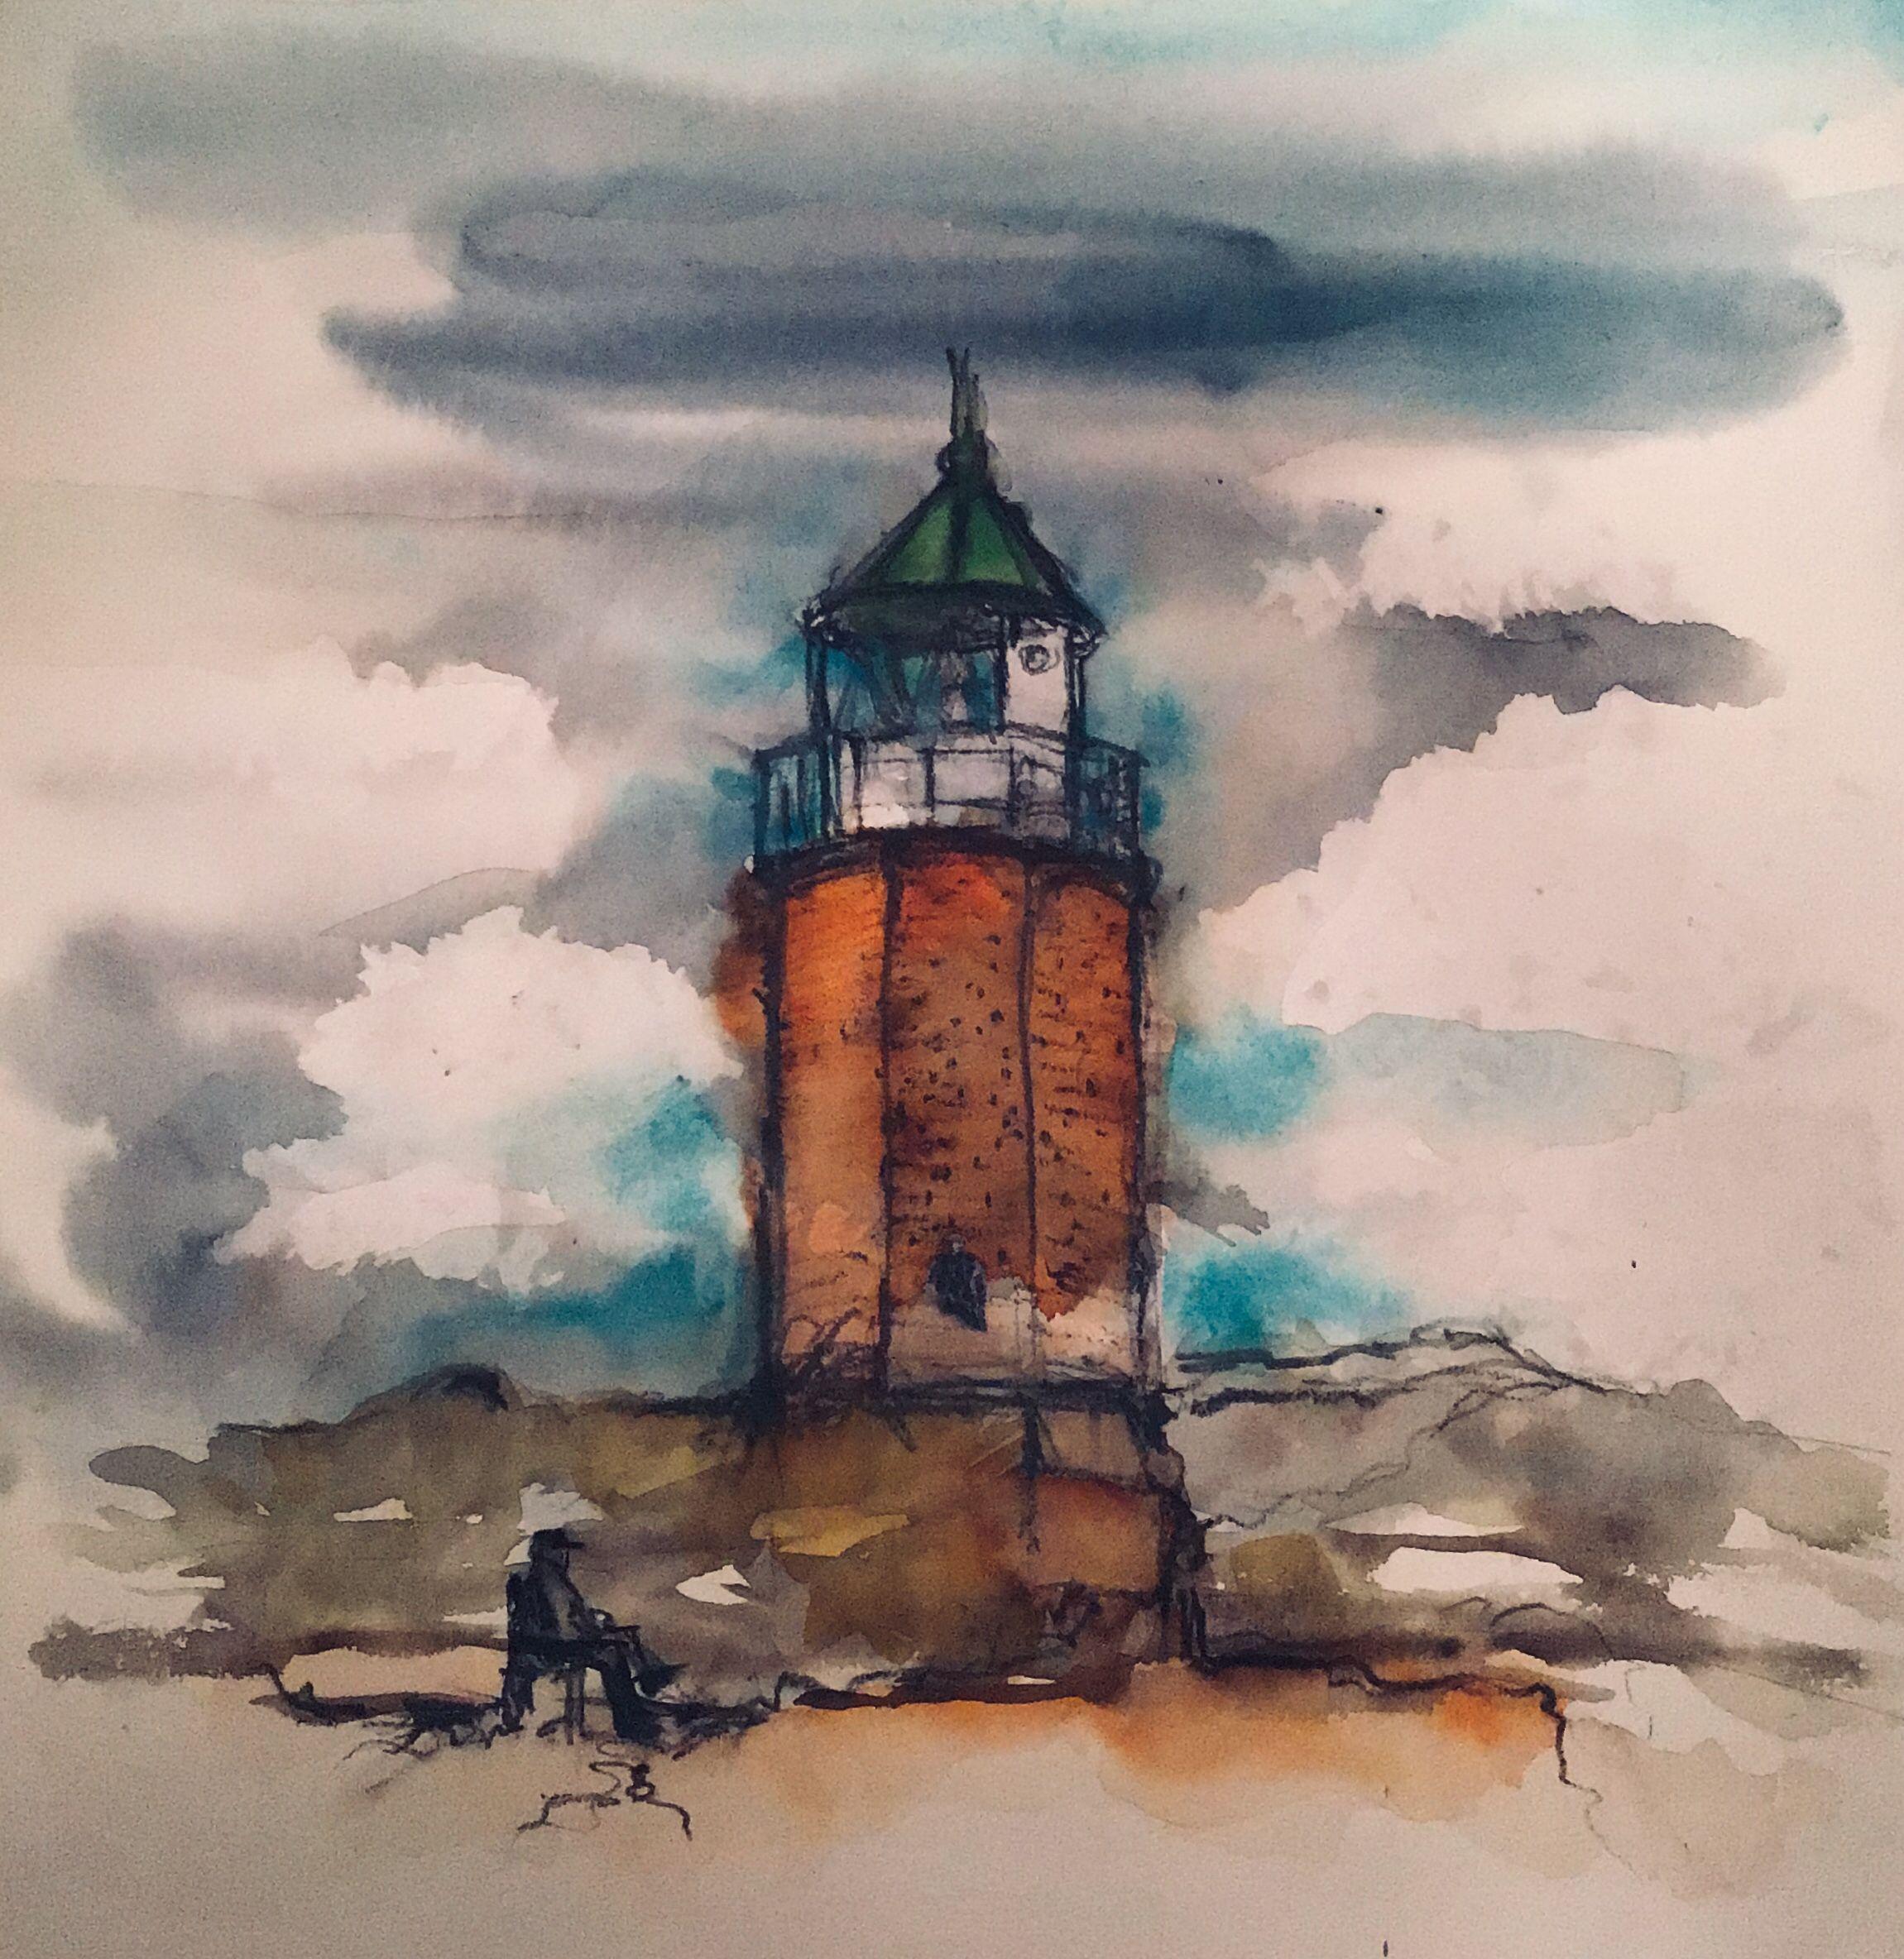 Sylt Leuchtturm Aquarell Watercolour Zeichnung Bildformat 35 X 35